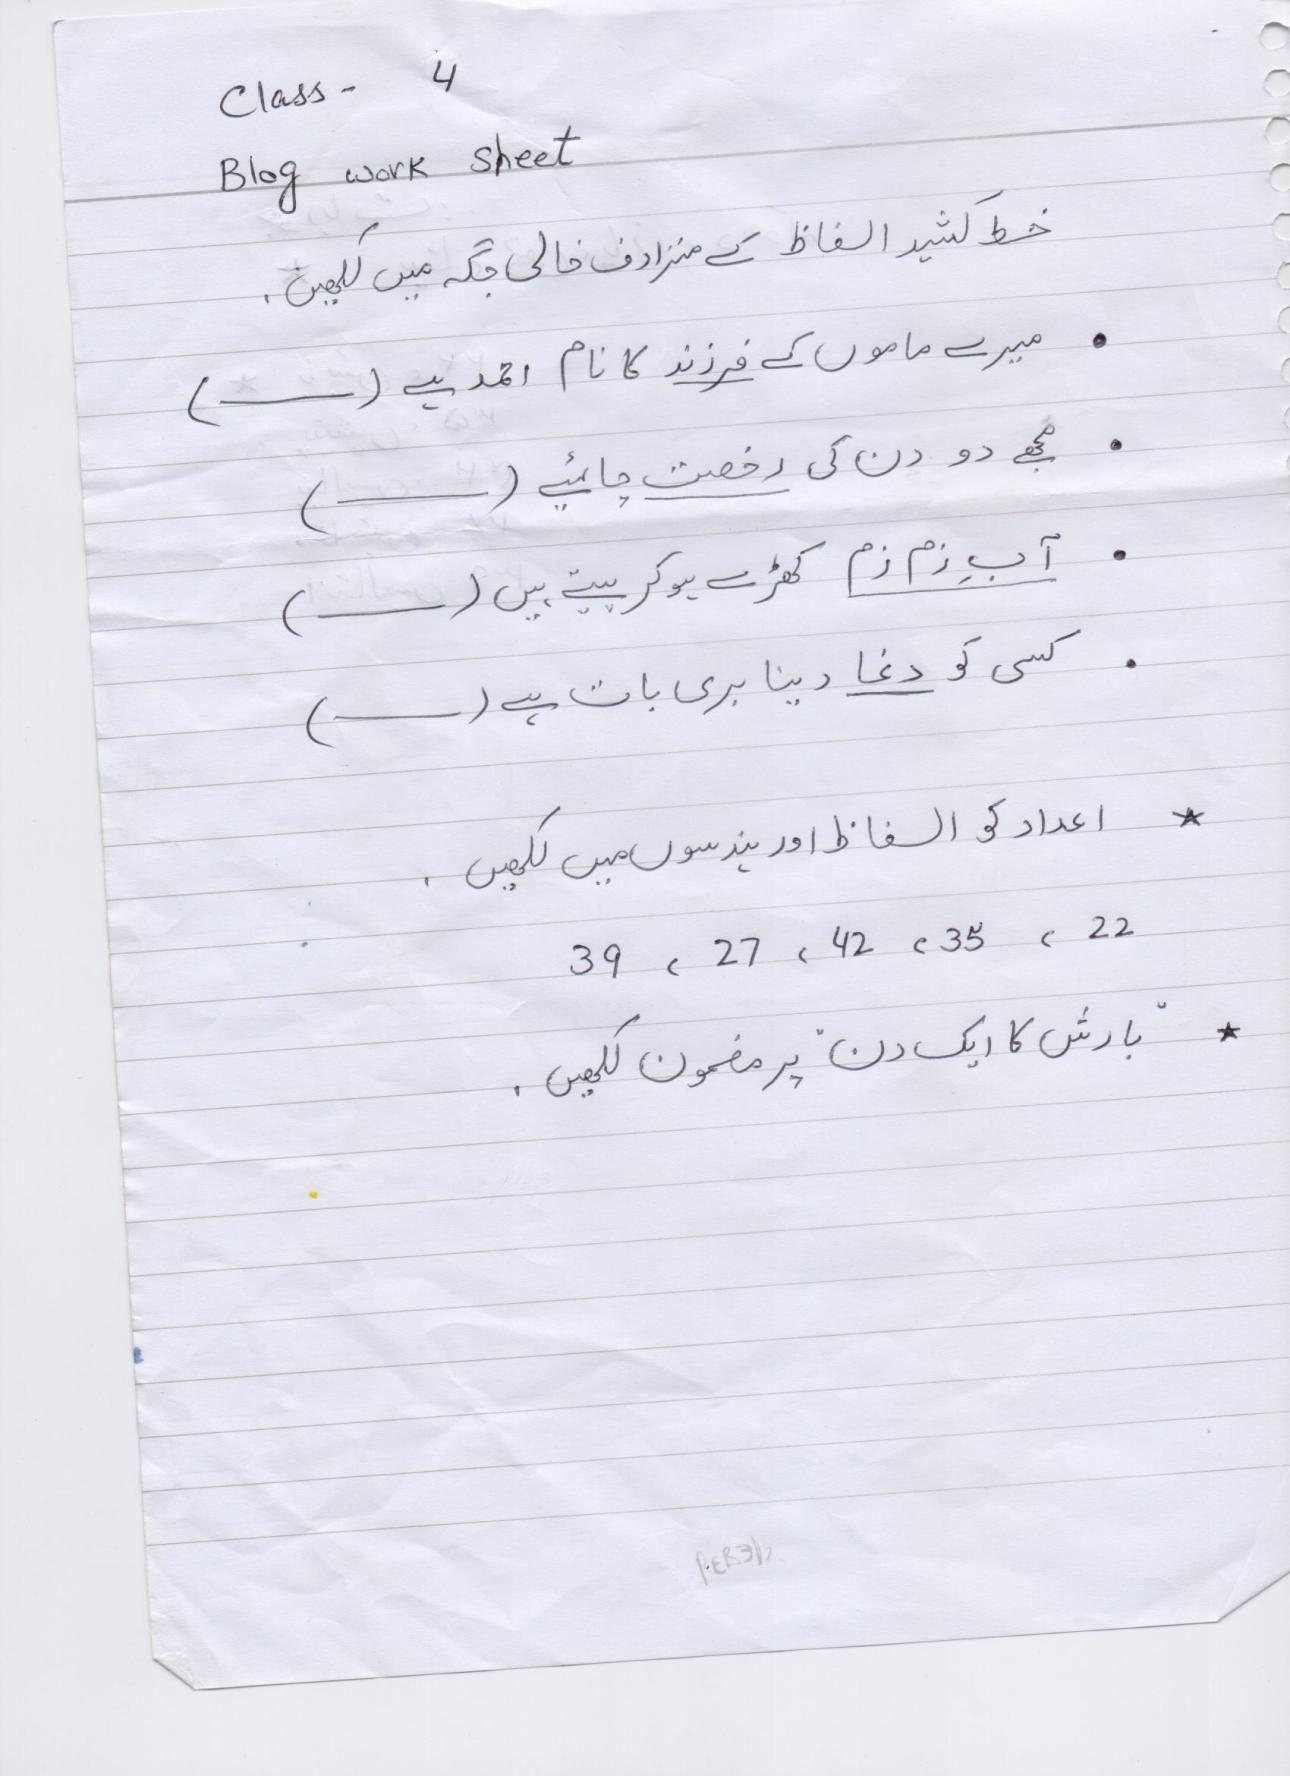 urdu-blog-worksheet-class-4-26-09-16-2   Reading comprehension worksheets [ 1776 x 1290 Pixel ]